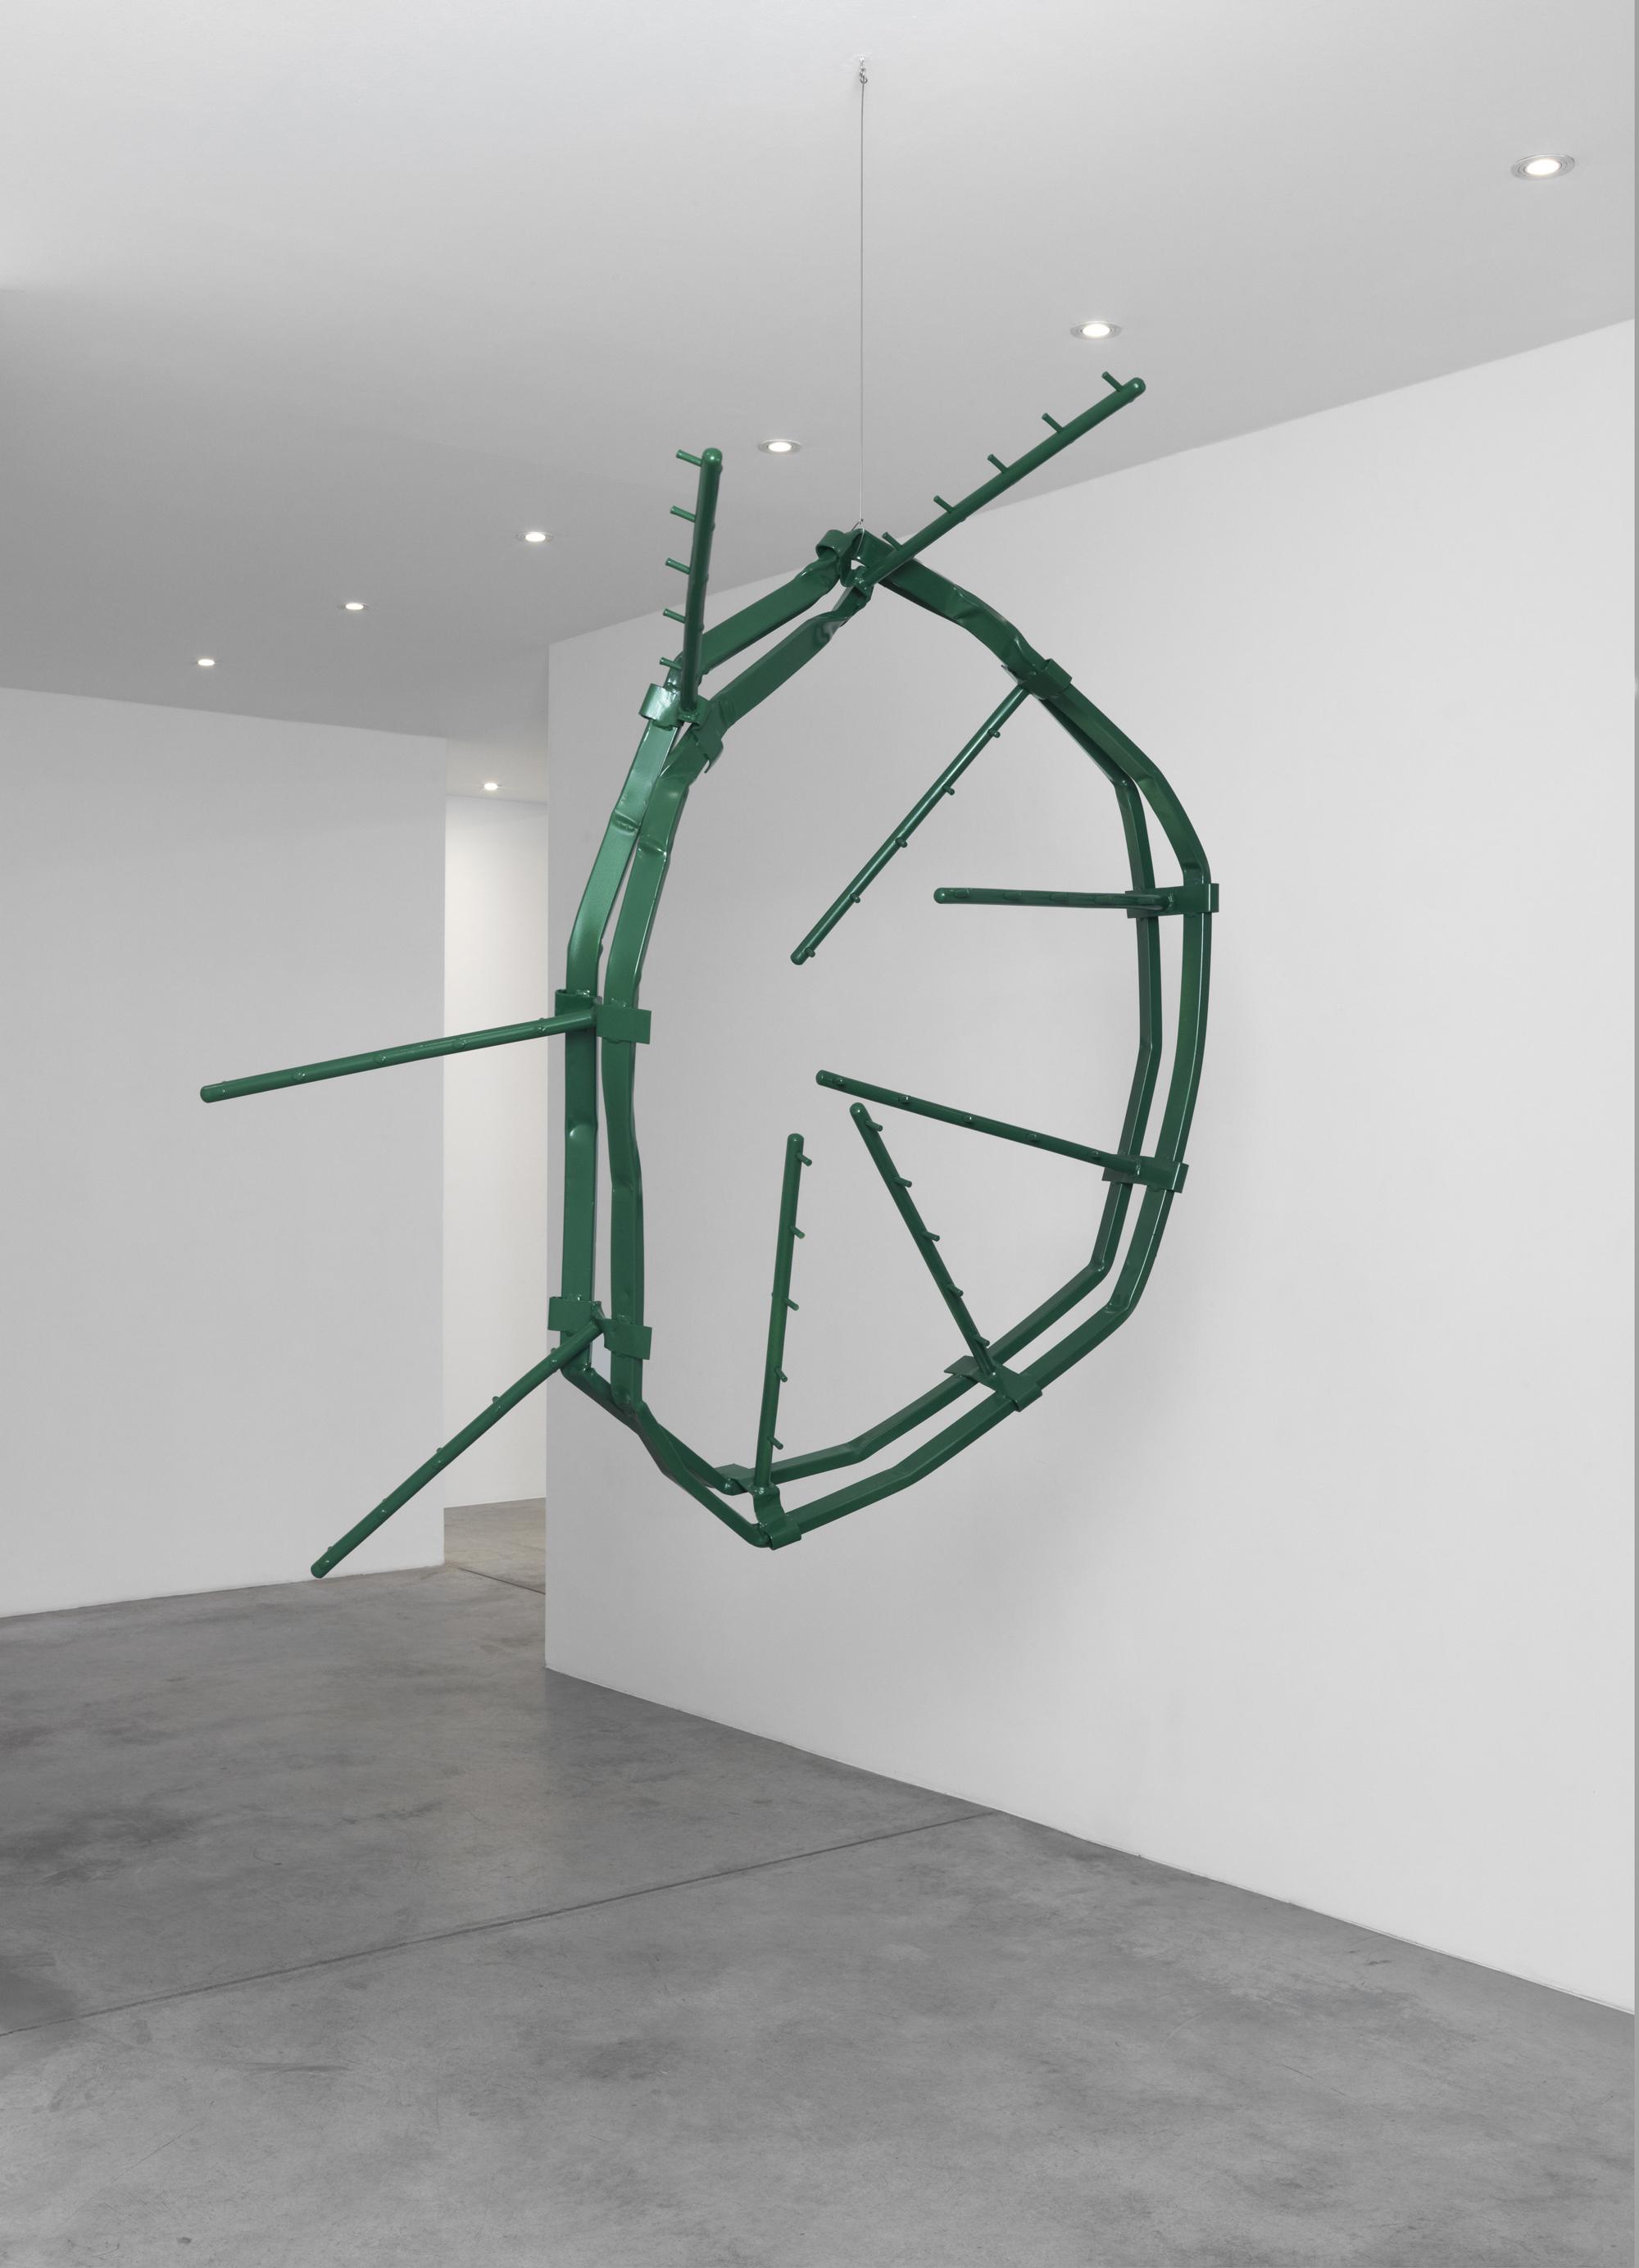 Monika Sosnowska, Untitled from series Market, 2012, 155 x 170 x 16 cm